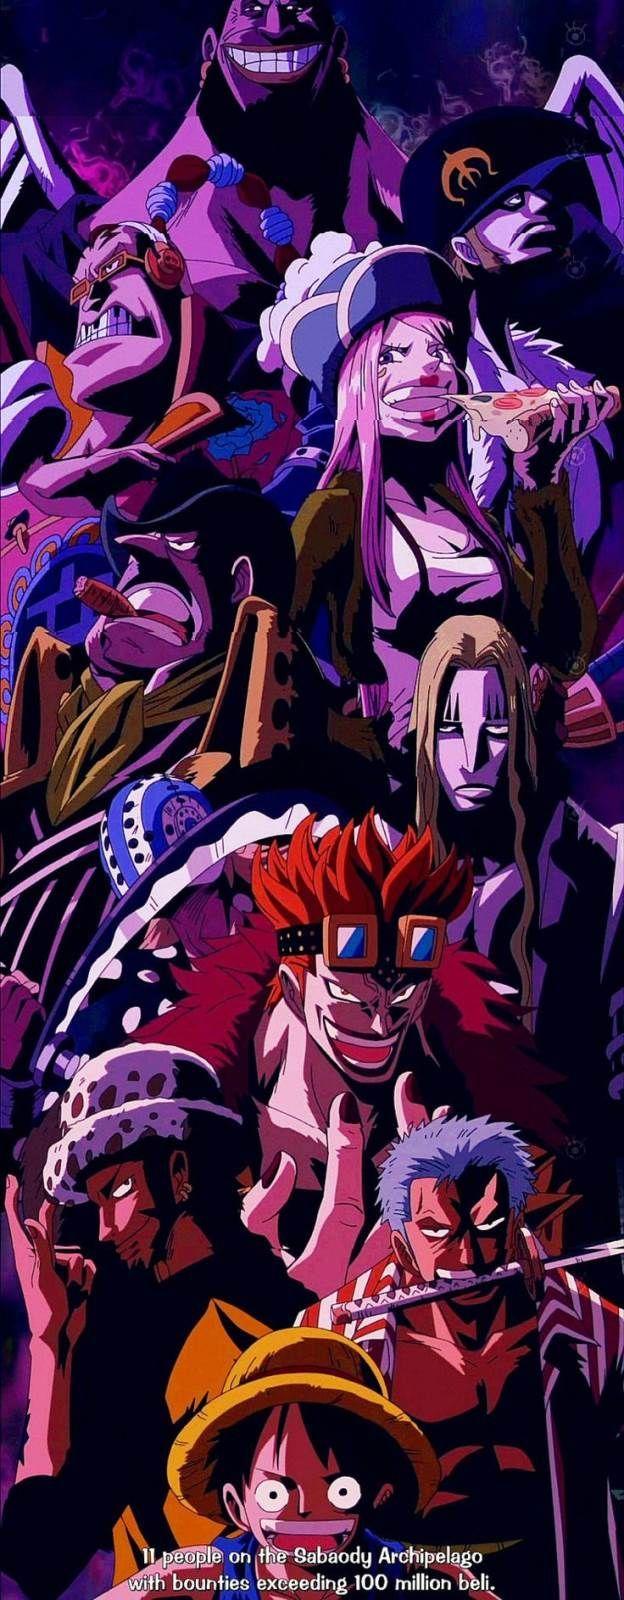 ONE PIECE, The 11 Super Novas, The Rookie pirates, Monkey